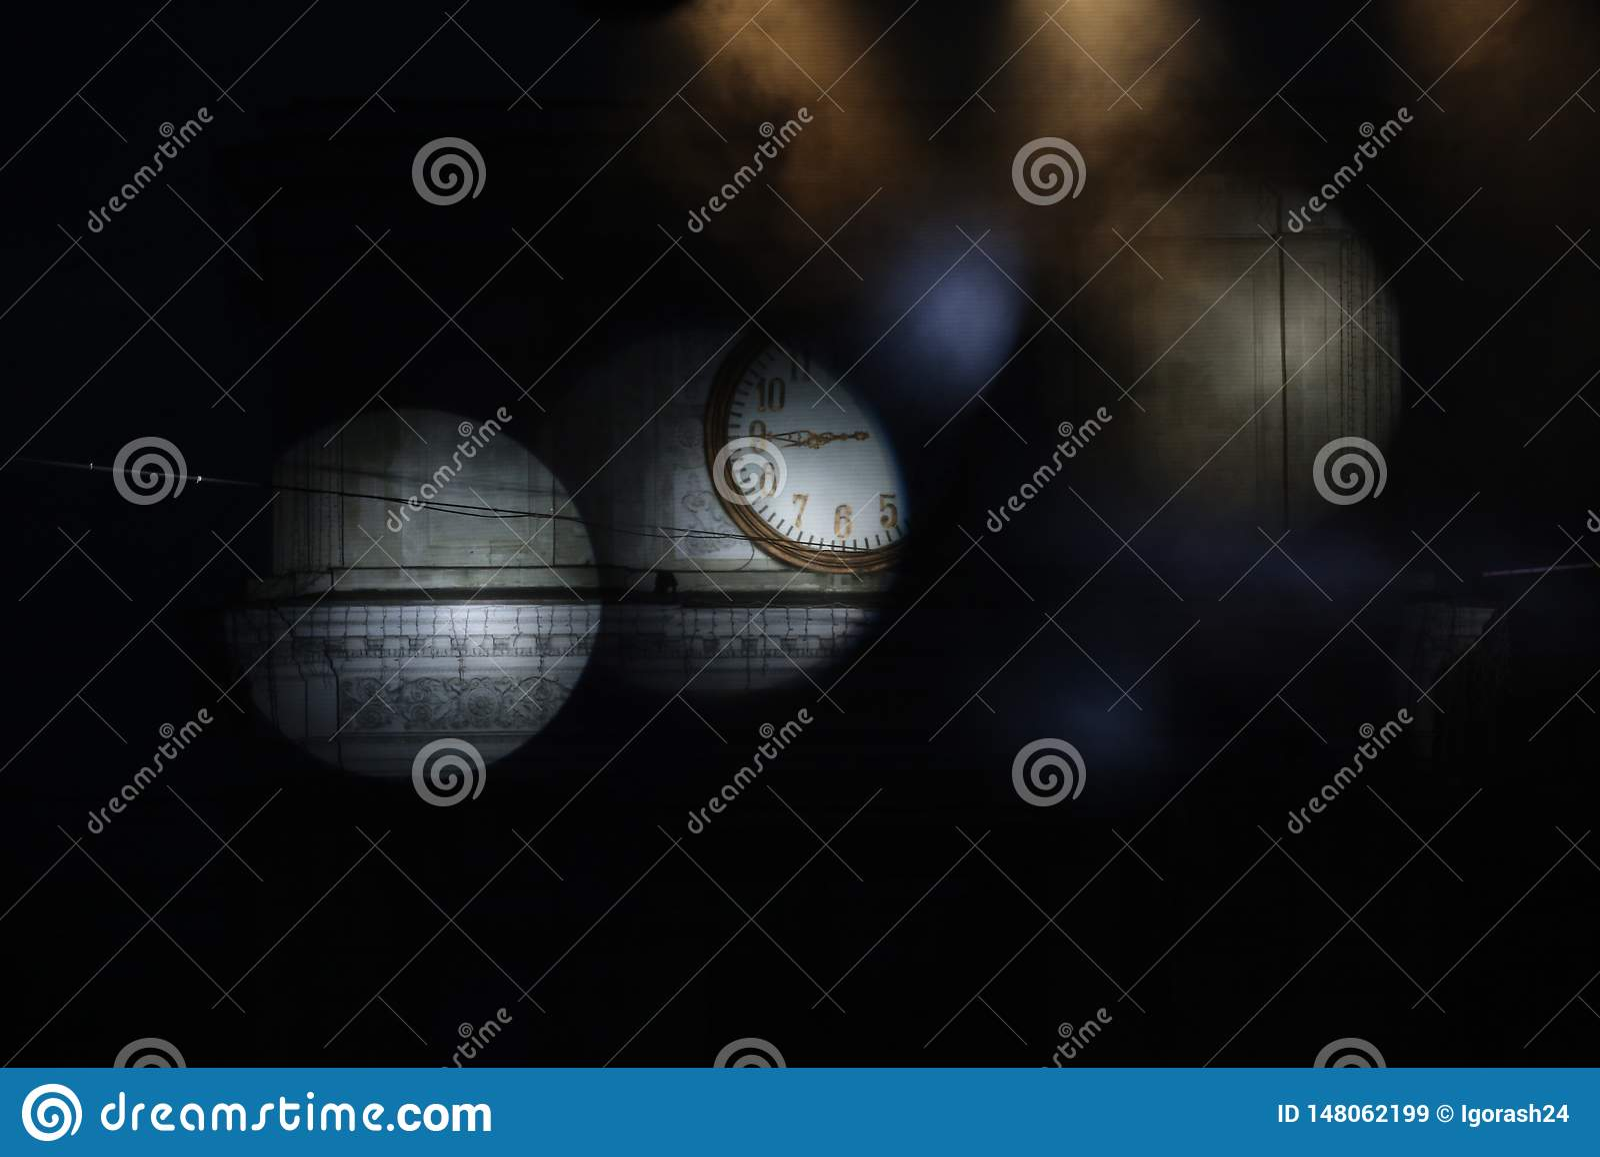 темнота в Молдавии, ночь Кишинев,